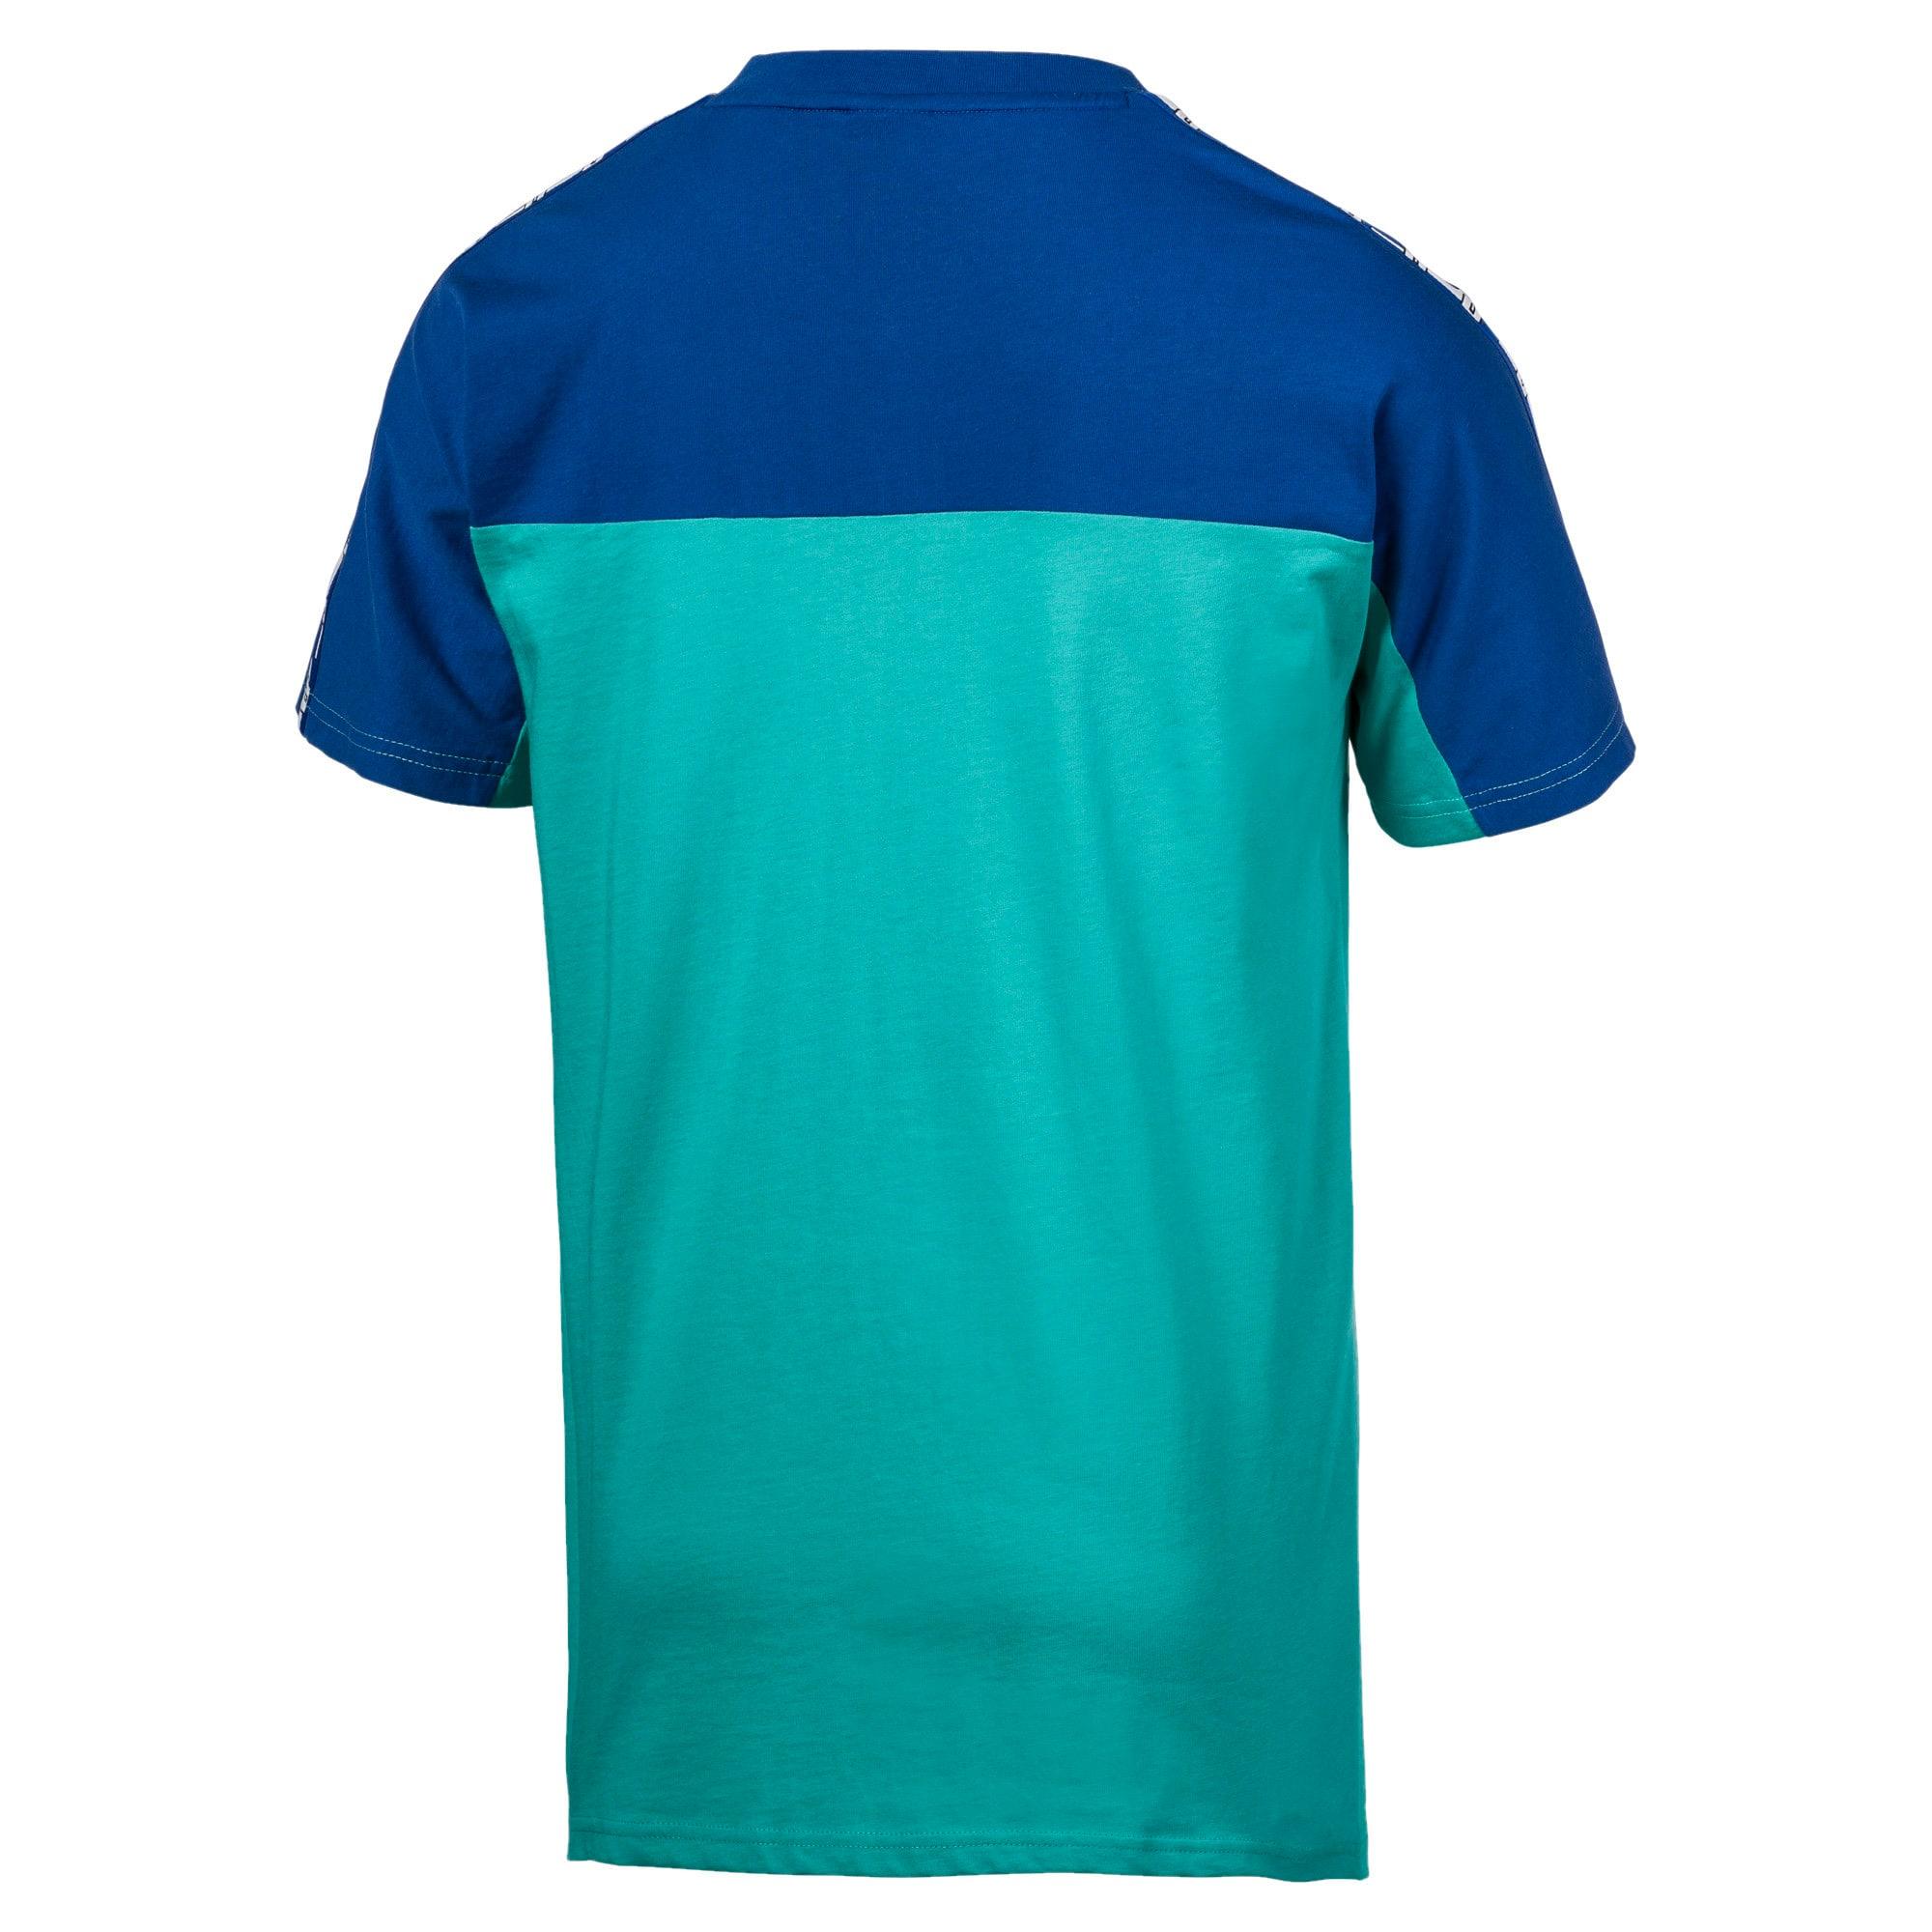 Thumbnail 6 of PUMA XTG SS Tシャツ 半袖, Blue Turquoise, medium-JPN